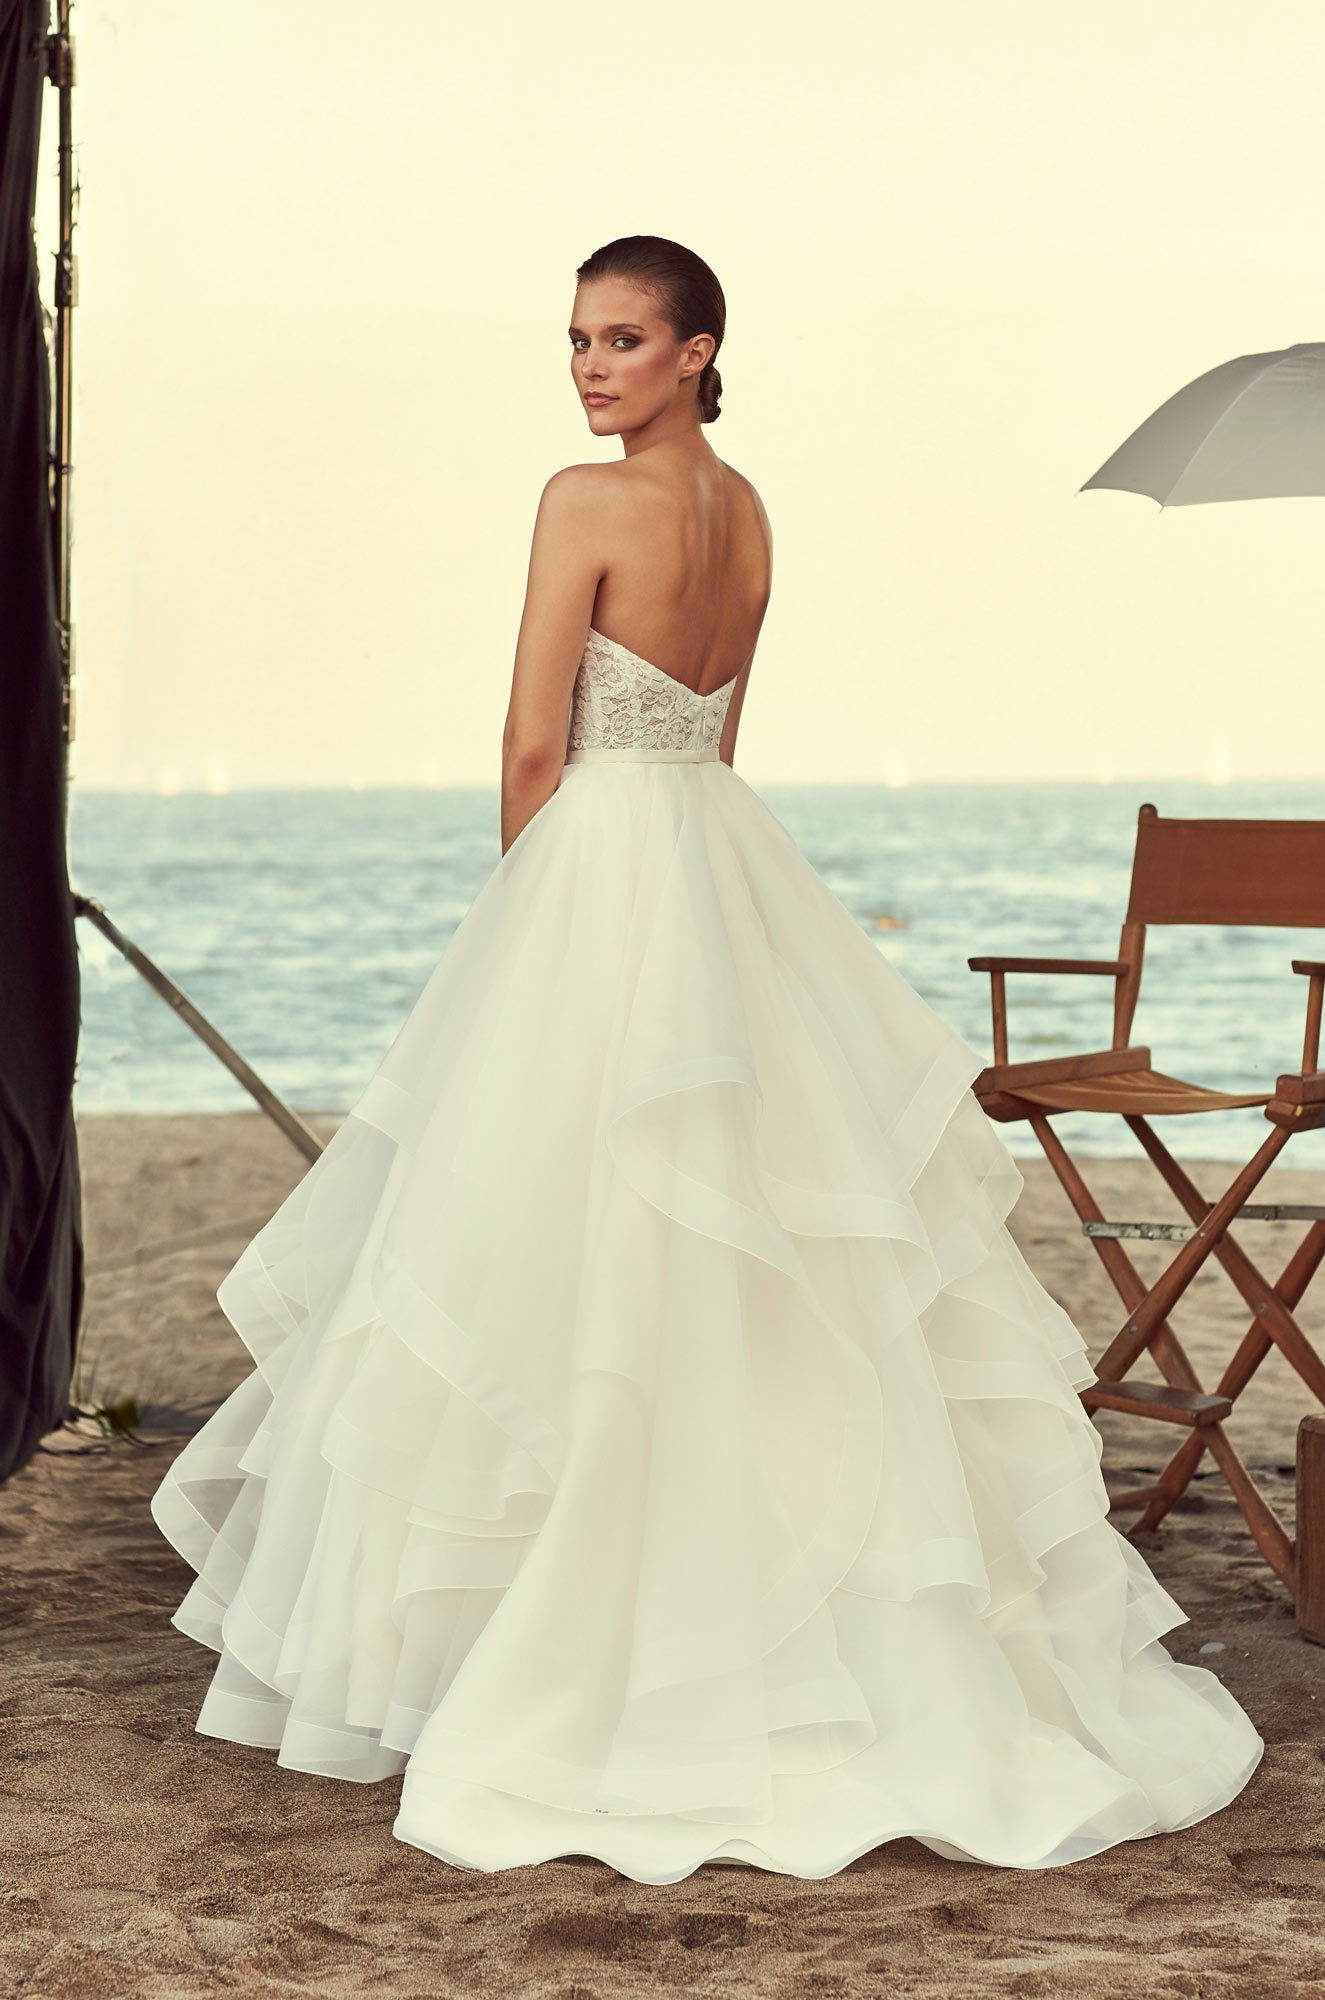 Strapless corset wedding dress style 2192 mikaella bridal junglespirit Gallery